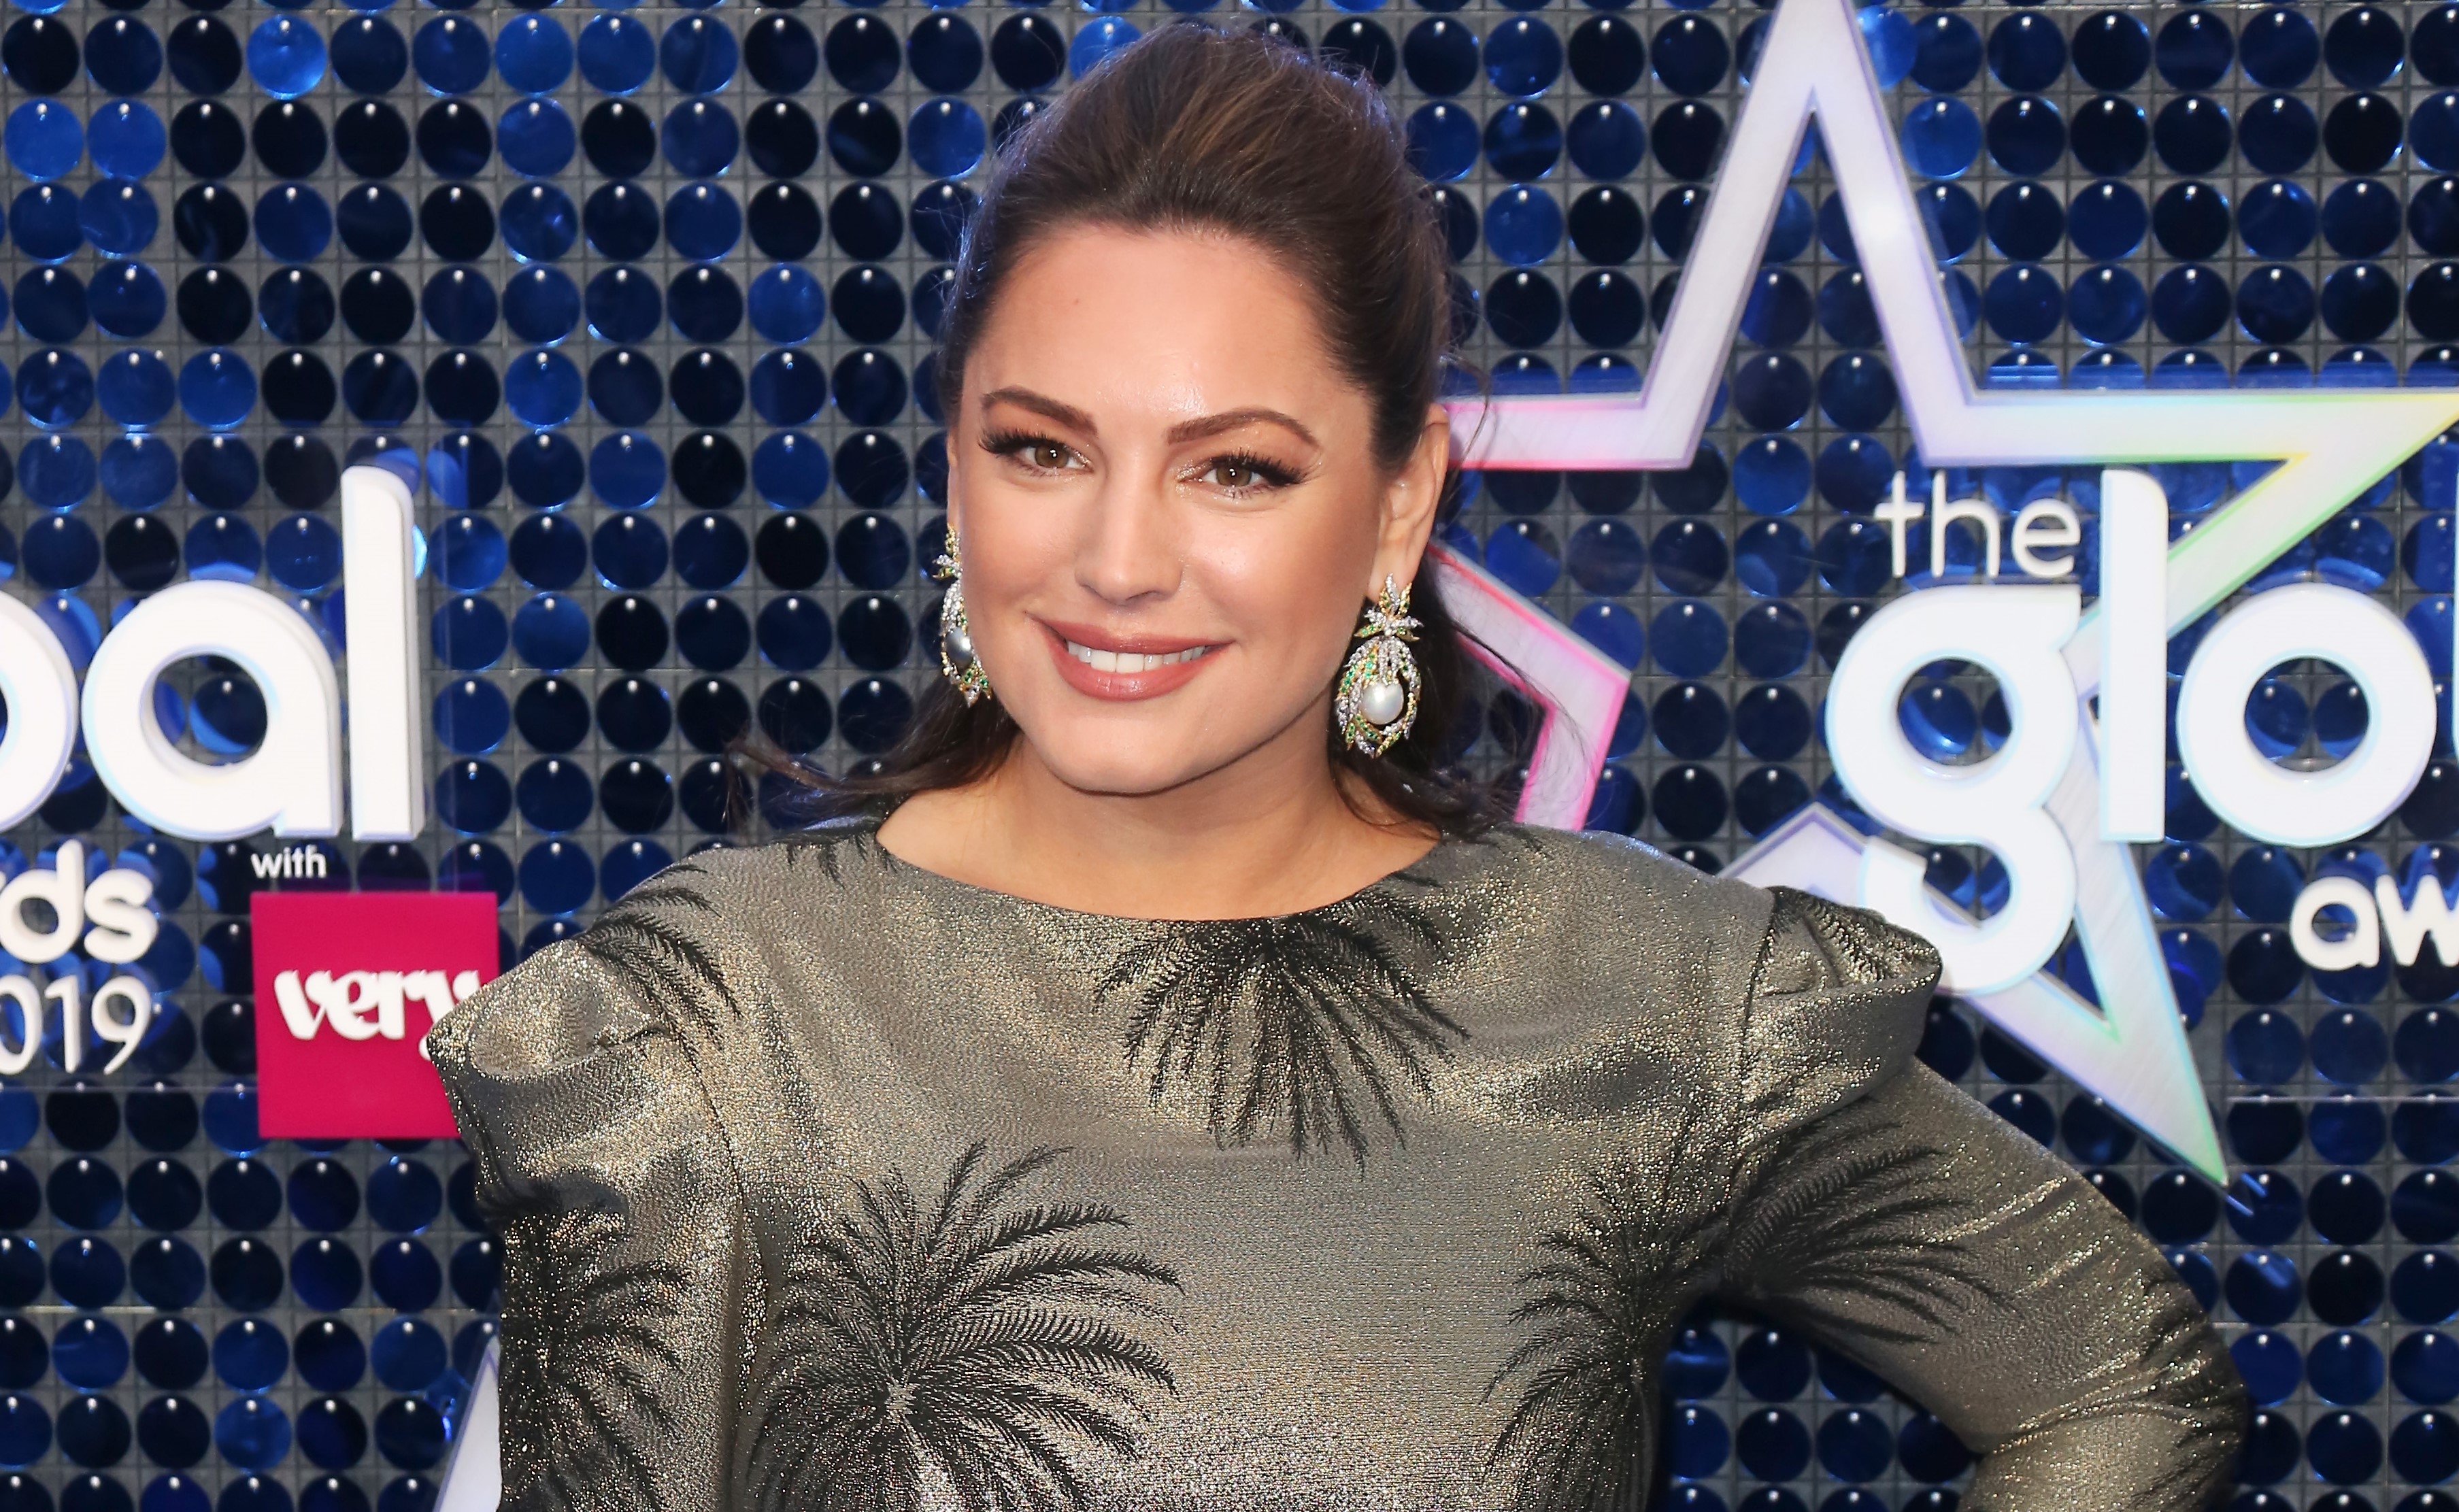 Fans call for Celebrity Love Island return after old host Kelly Brook shares throwback